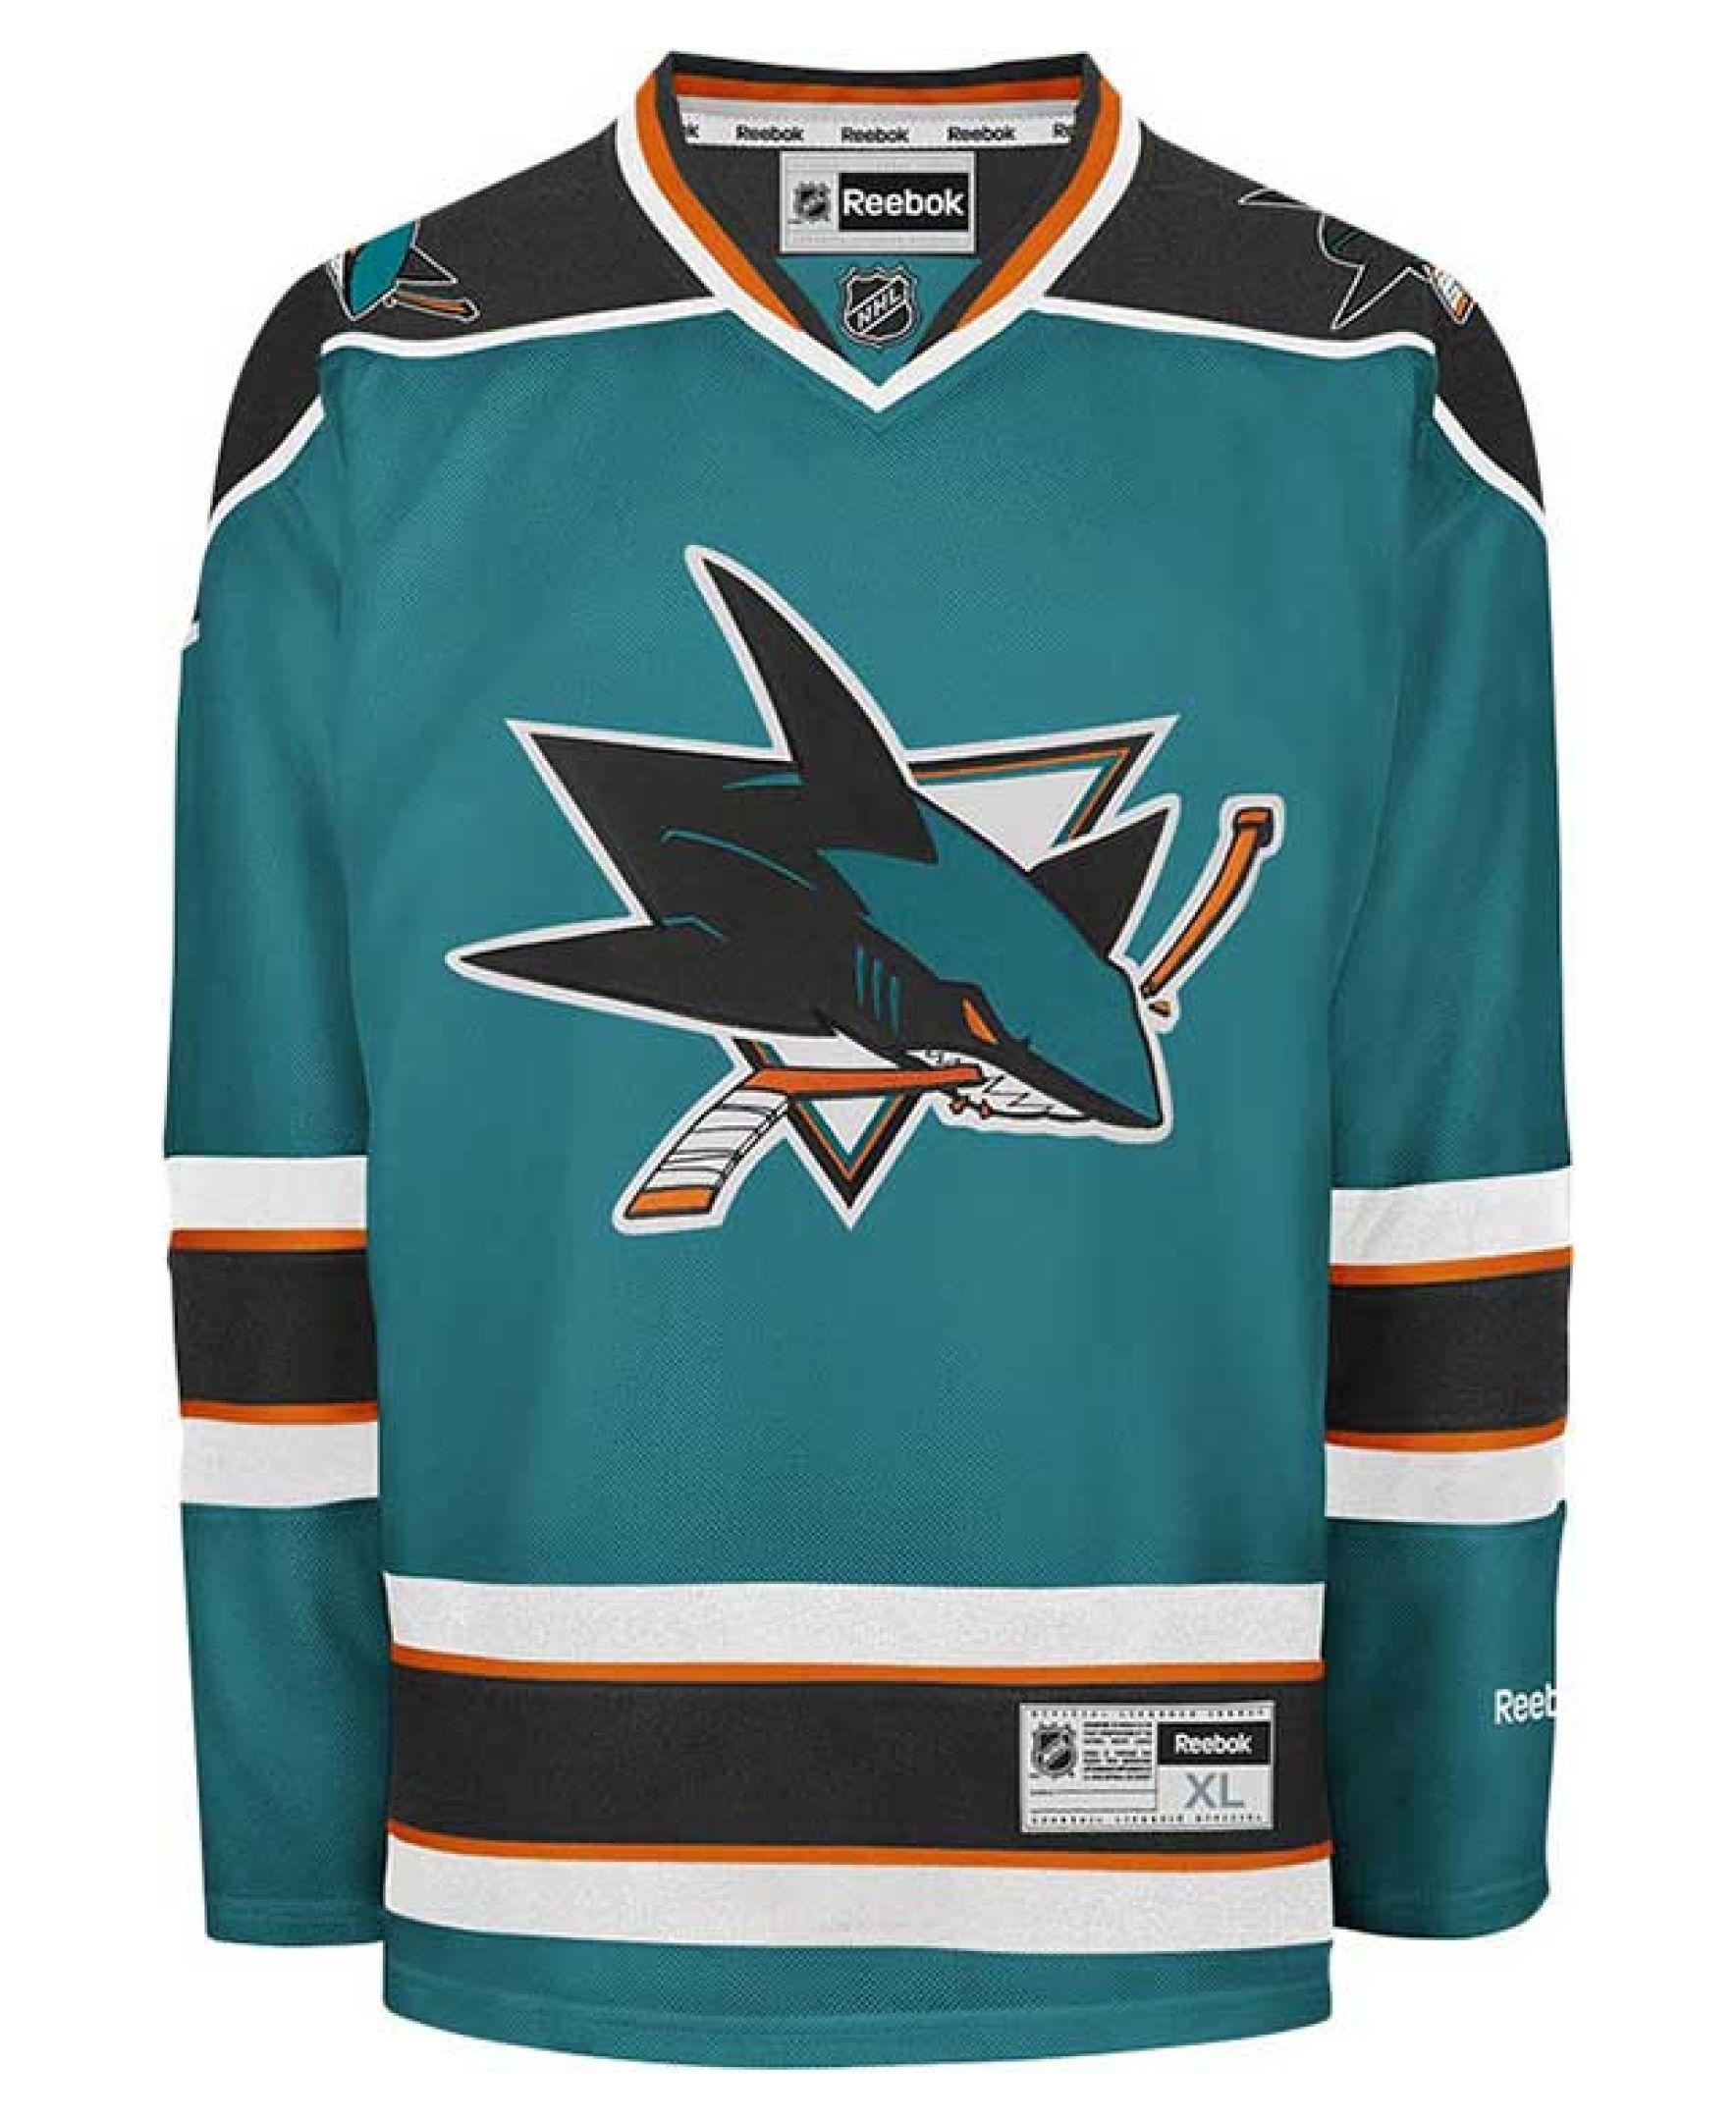 b0666379f7d Reebok Men's San Jose Sharks Premier Jersey | San Jose Sharks ...